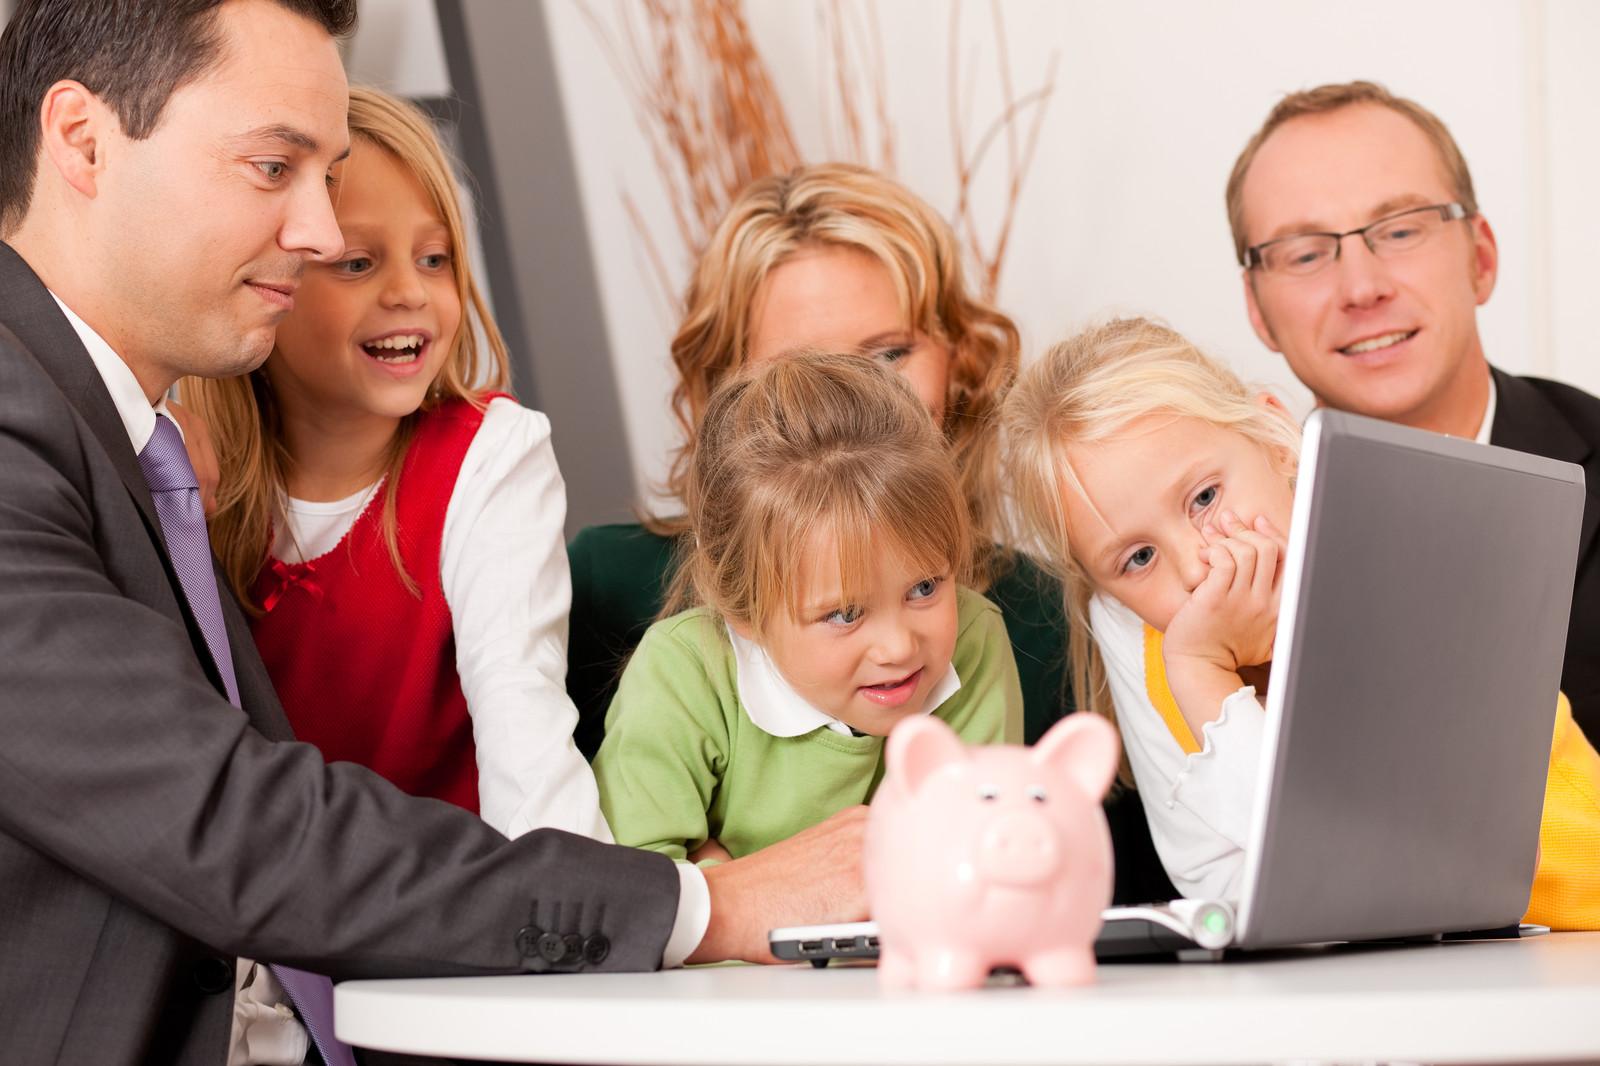 Family Business Advising